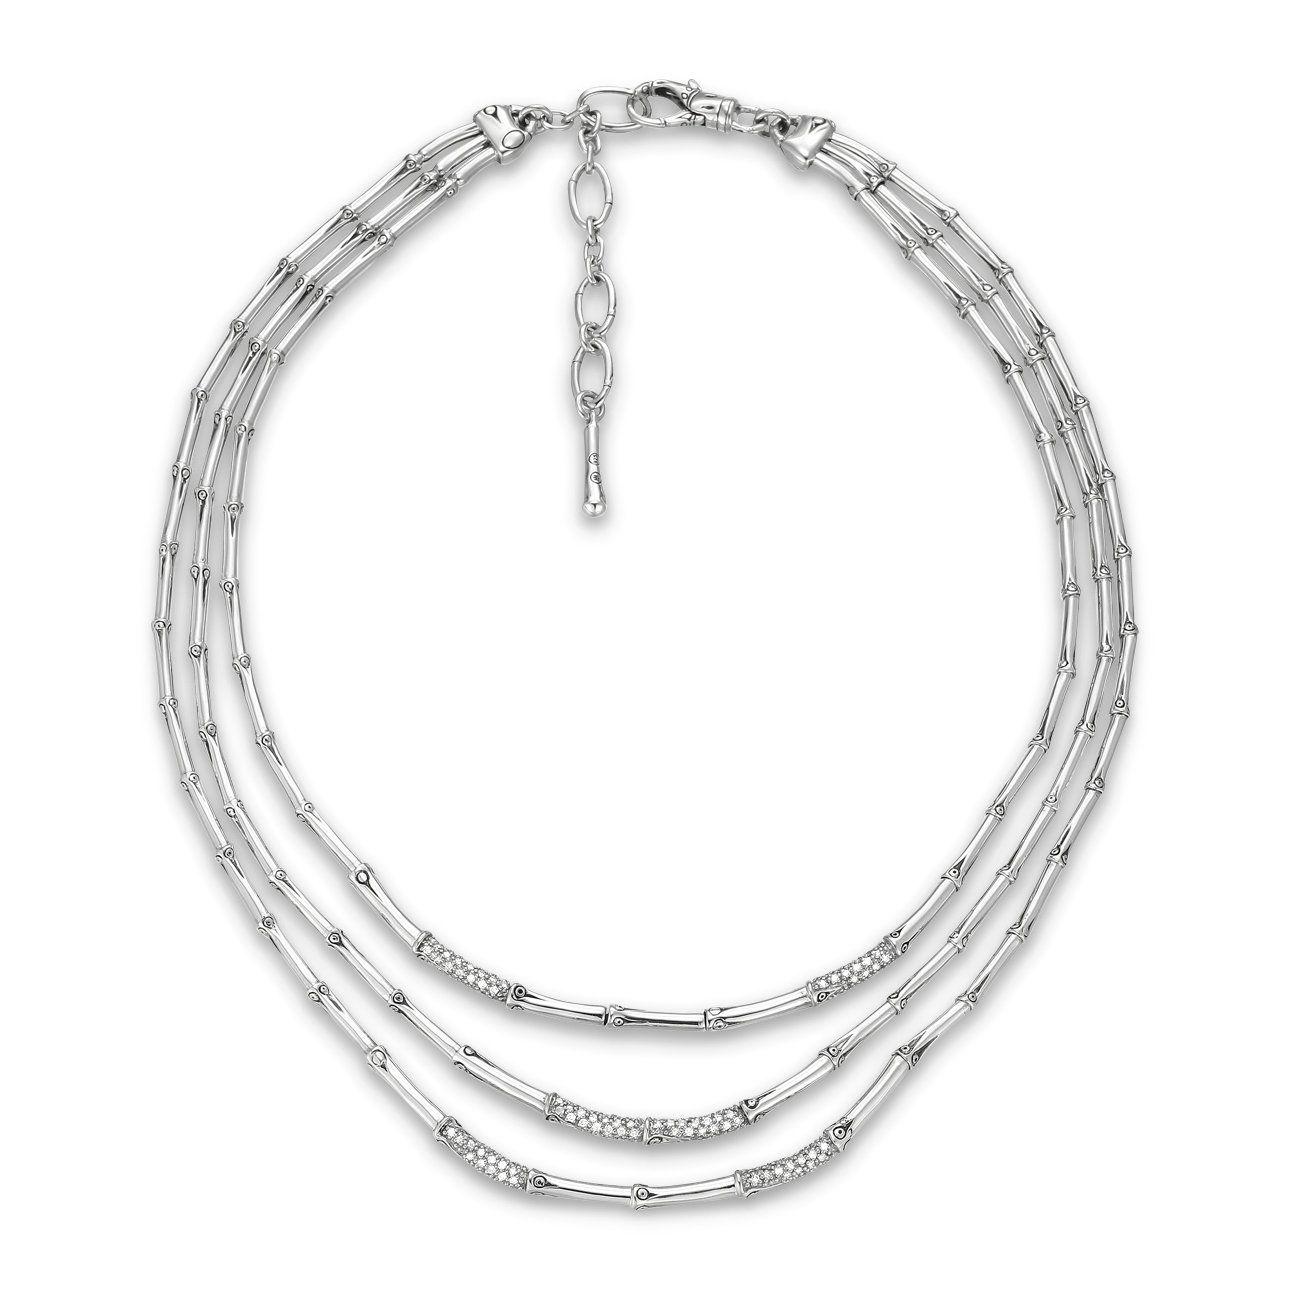 39+ John hardy jewelry bamboo collection ideas